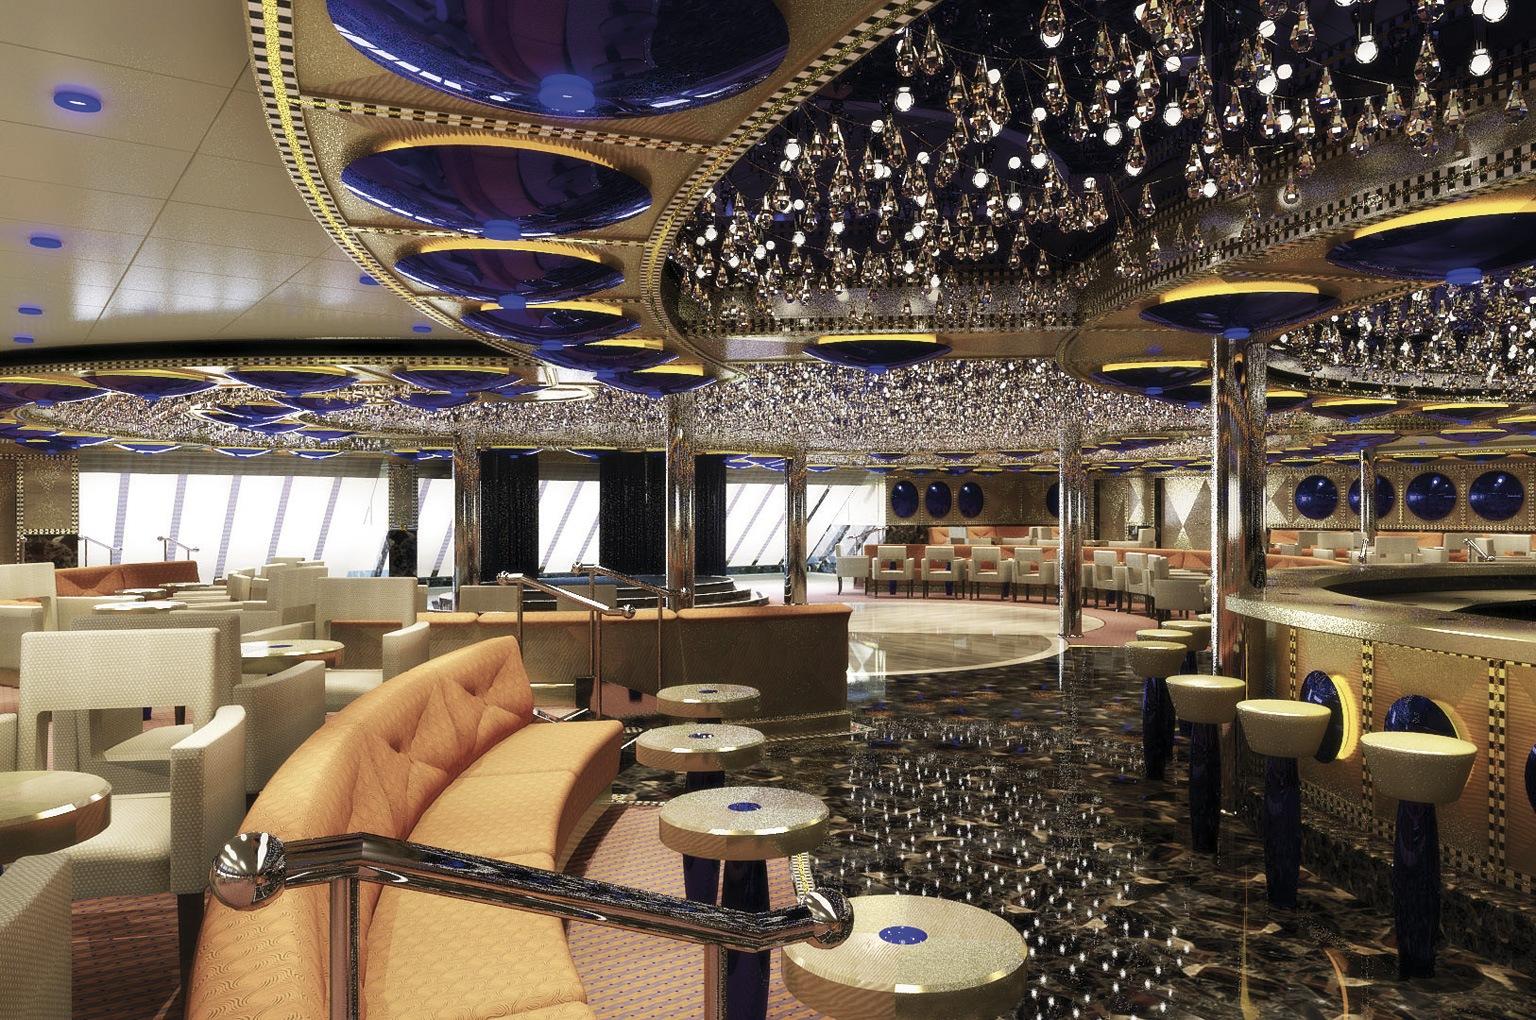 Cheap Cruise Deals >> Costa Favolosa Cruise Ship | Reviews & Itineraries